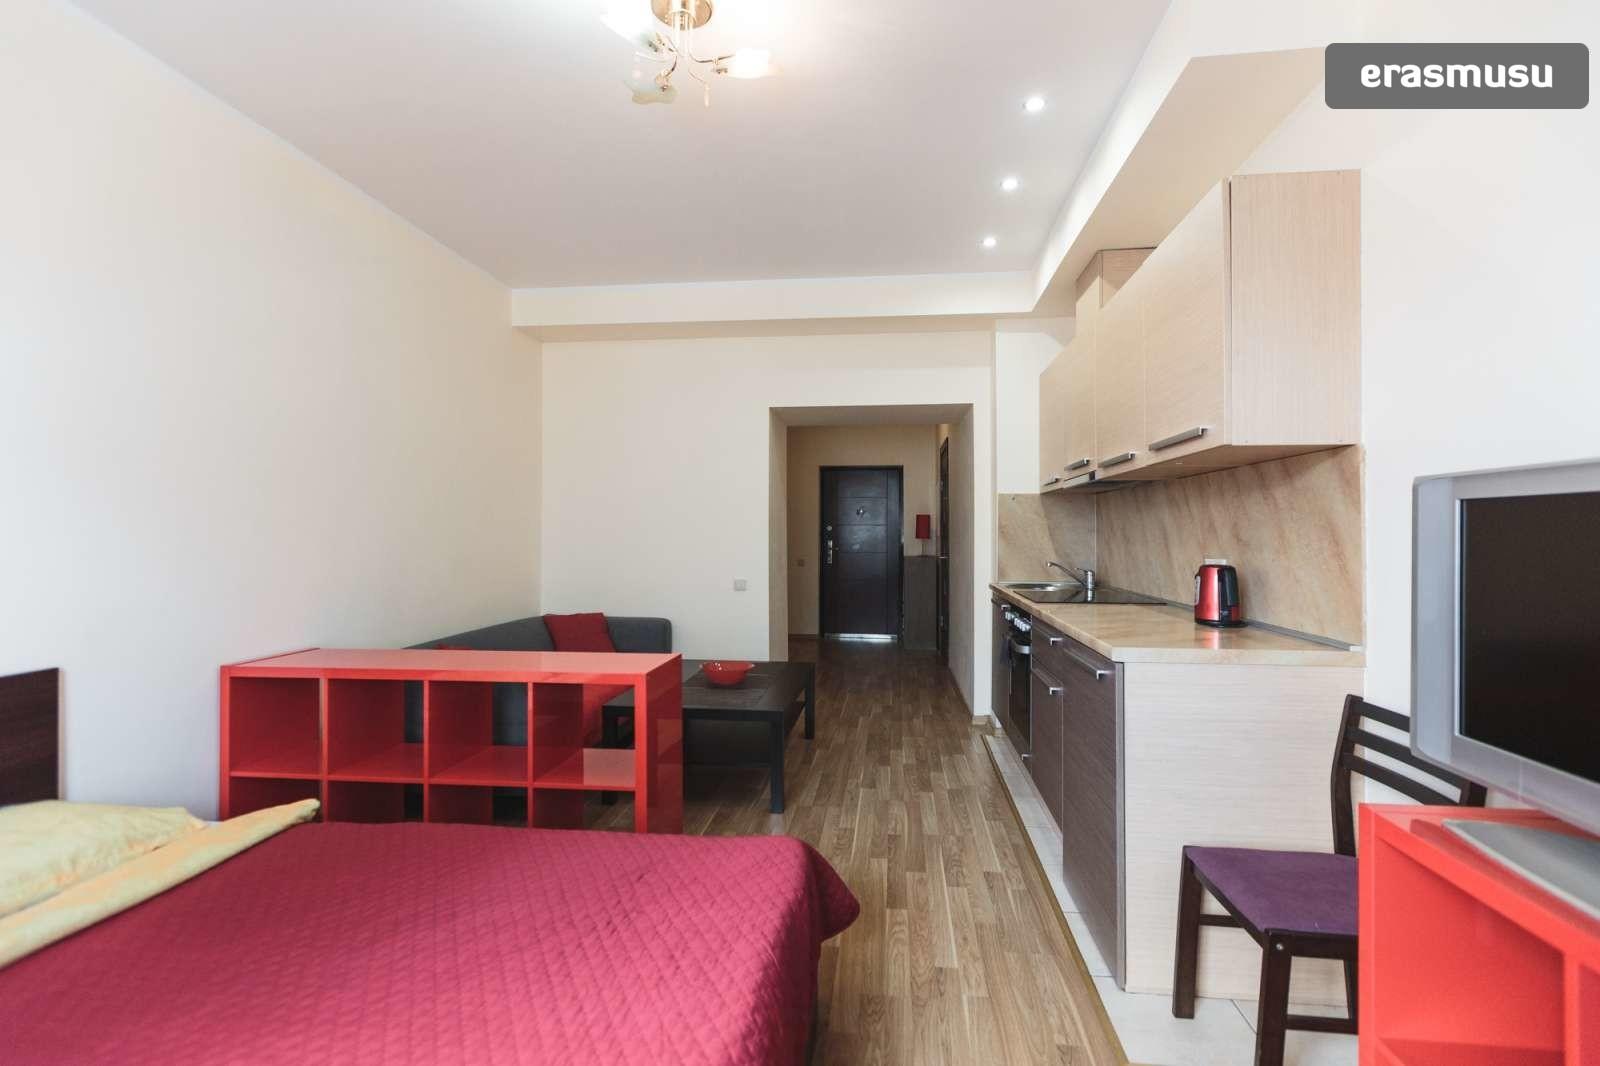 modern-studio-apartment-rent-maskavas-forstate-983fbb6d71c6ce305